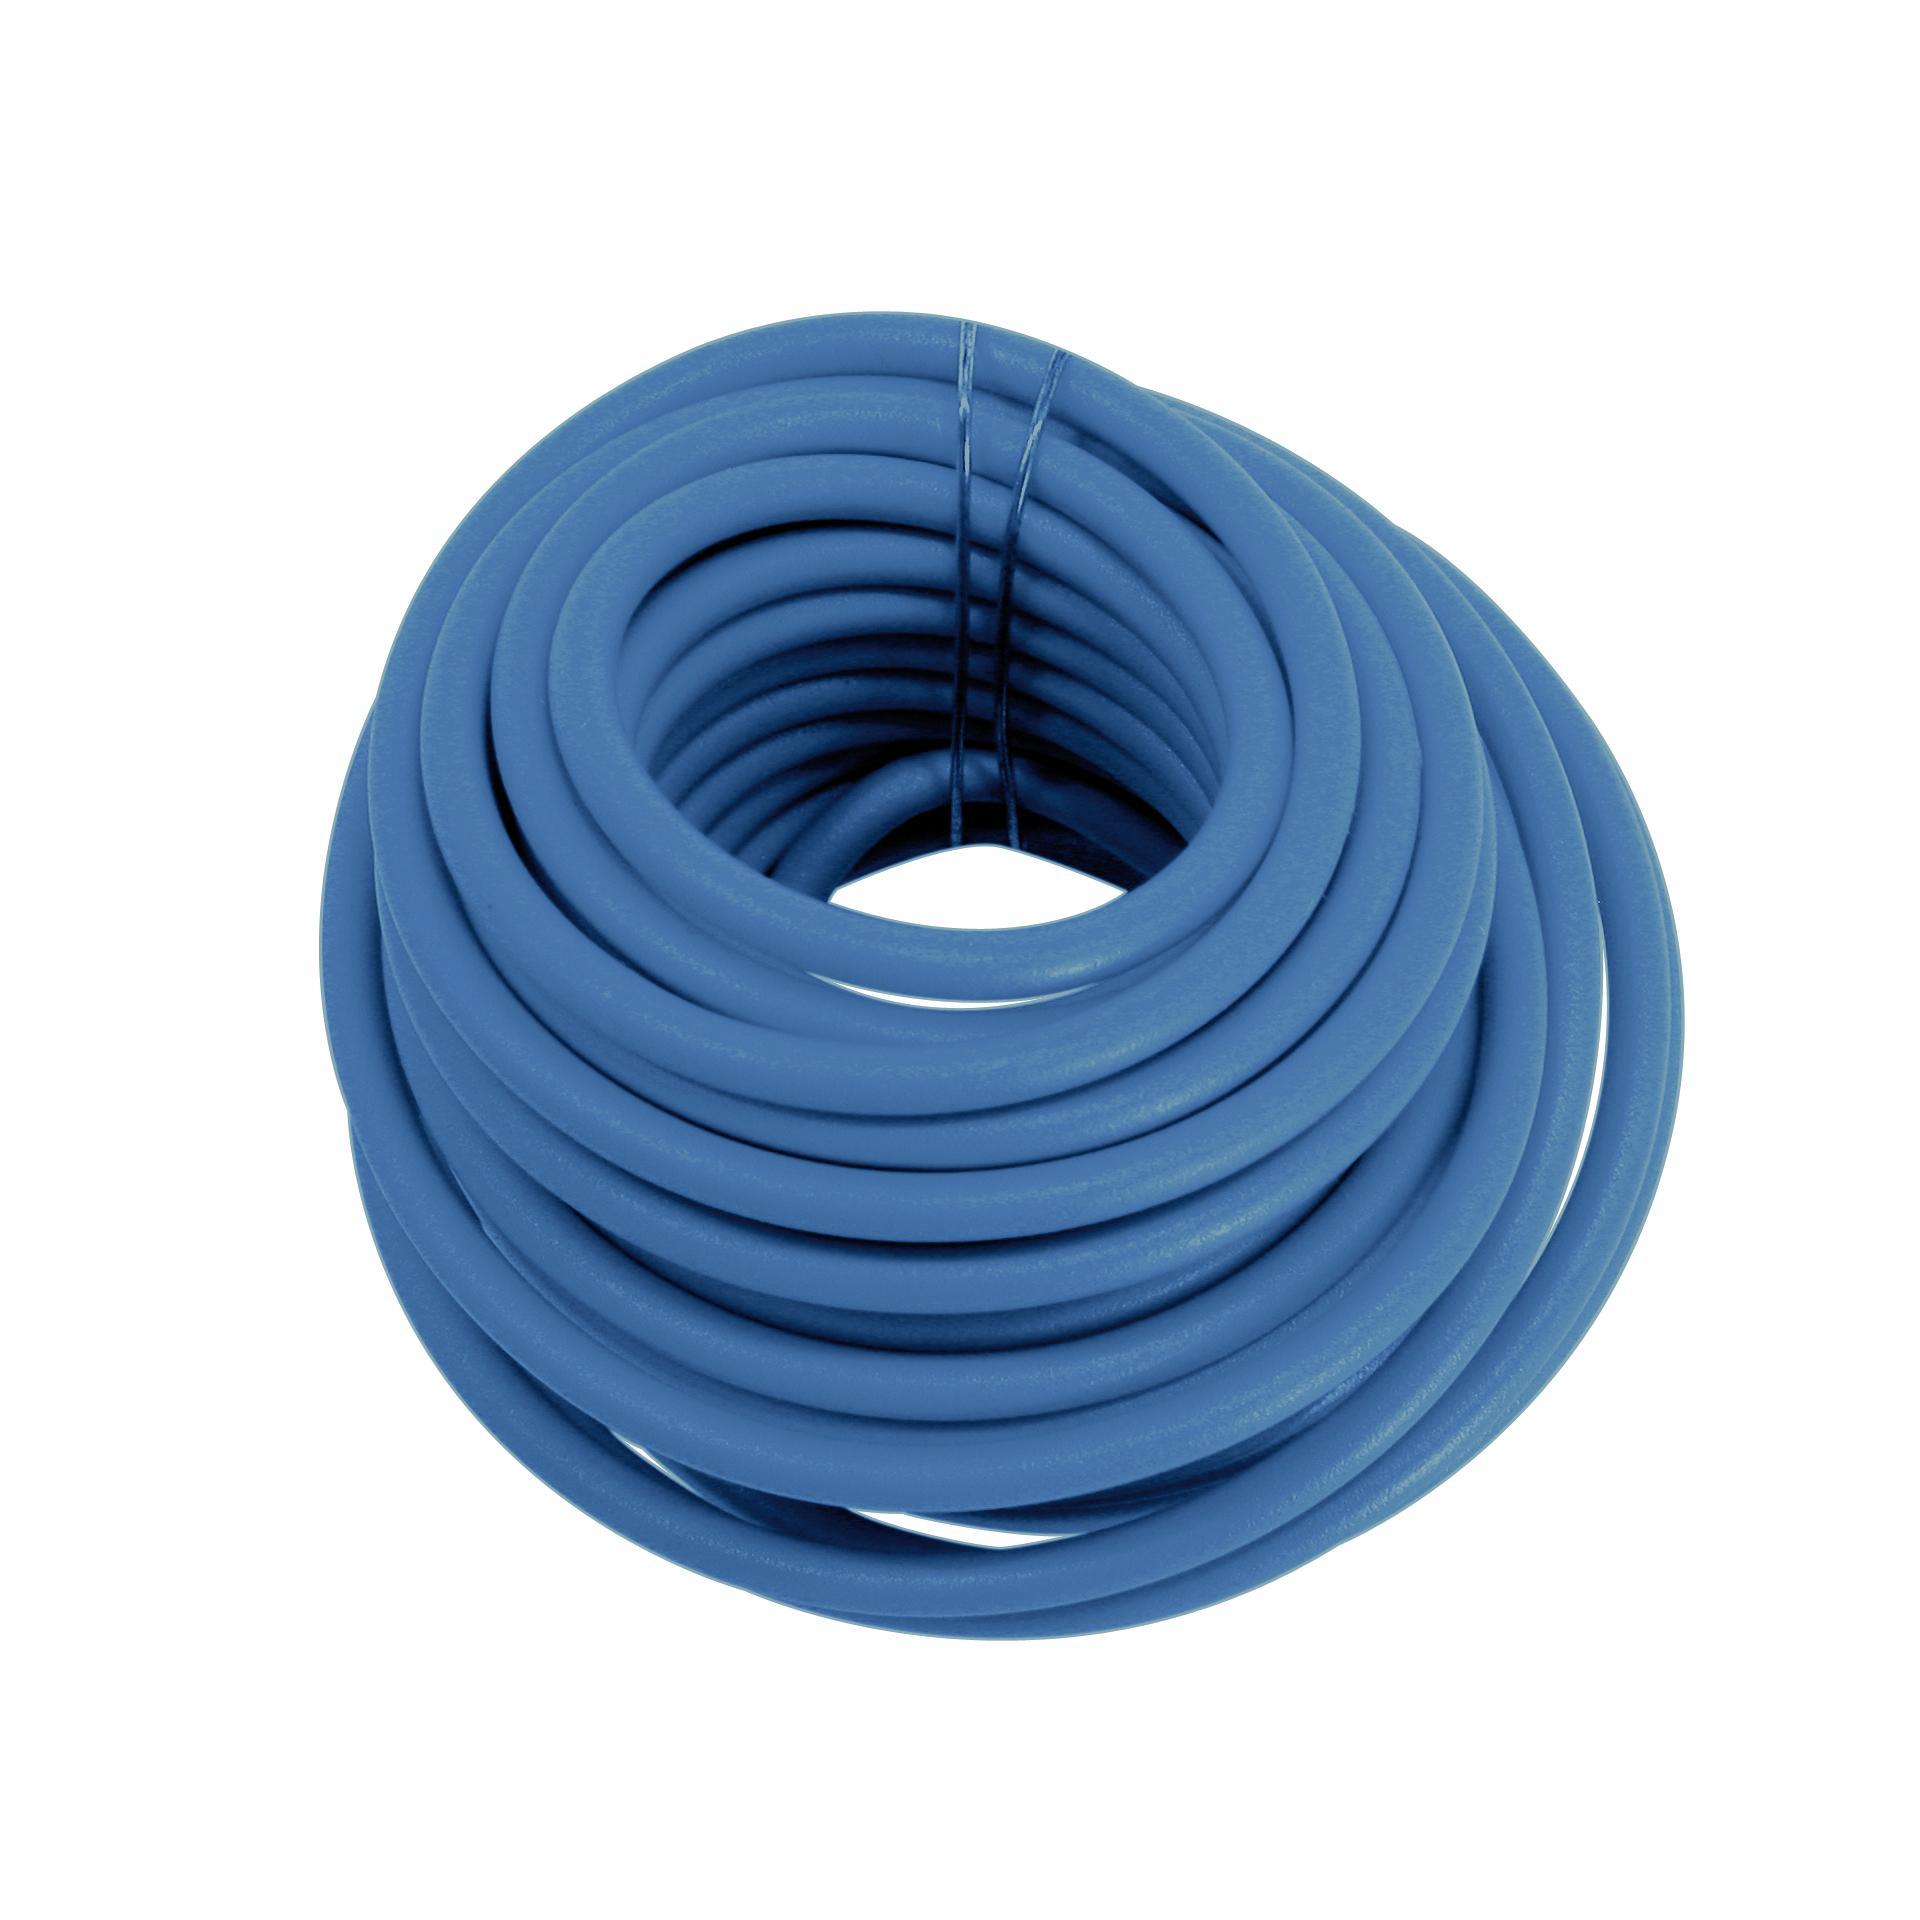 cables alim adnautomid cable 1 5mm2 bleu 5m. Black Bedroom Furniture Sets. Home Design Ideas